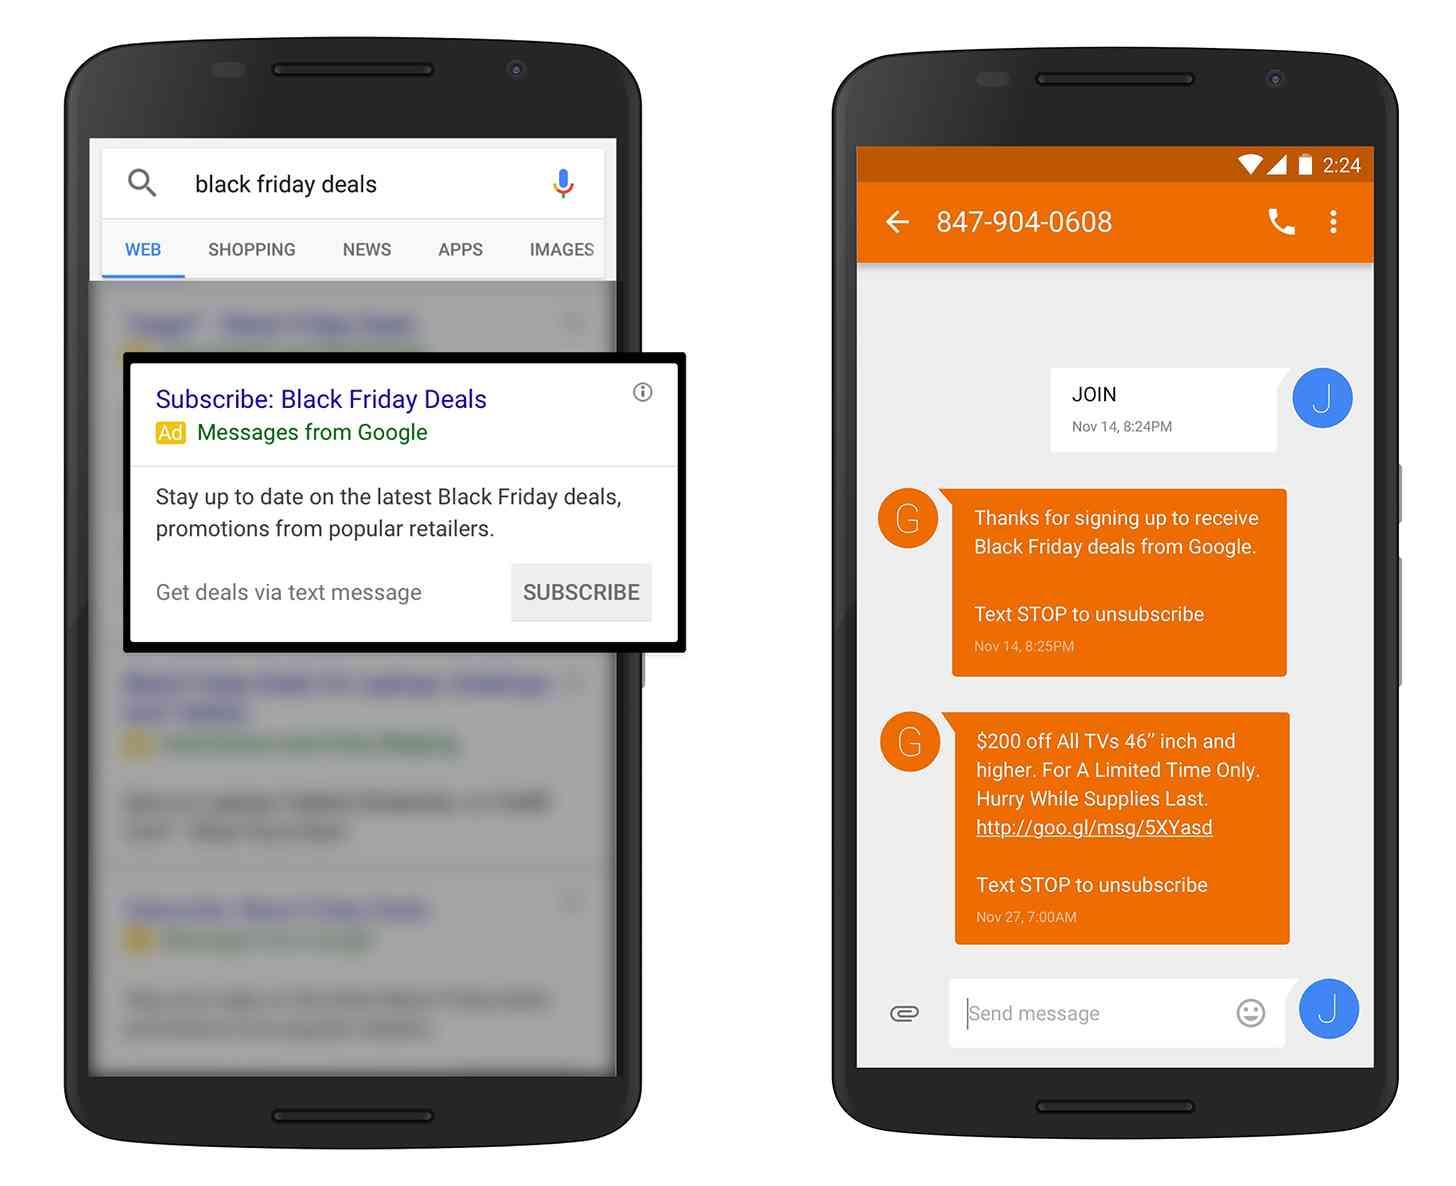 Googlesmsdeals Itok Fdetz Uj Google Send Text Messages Black Friday